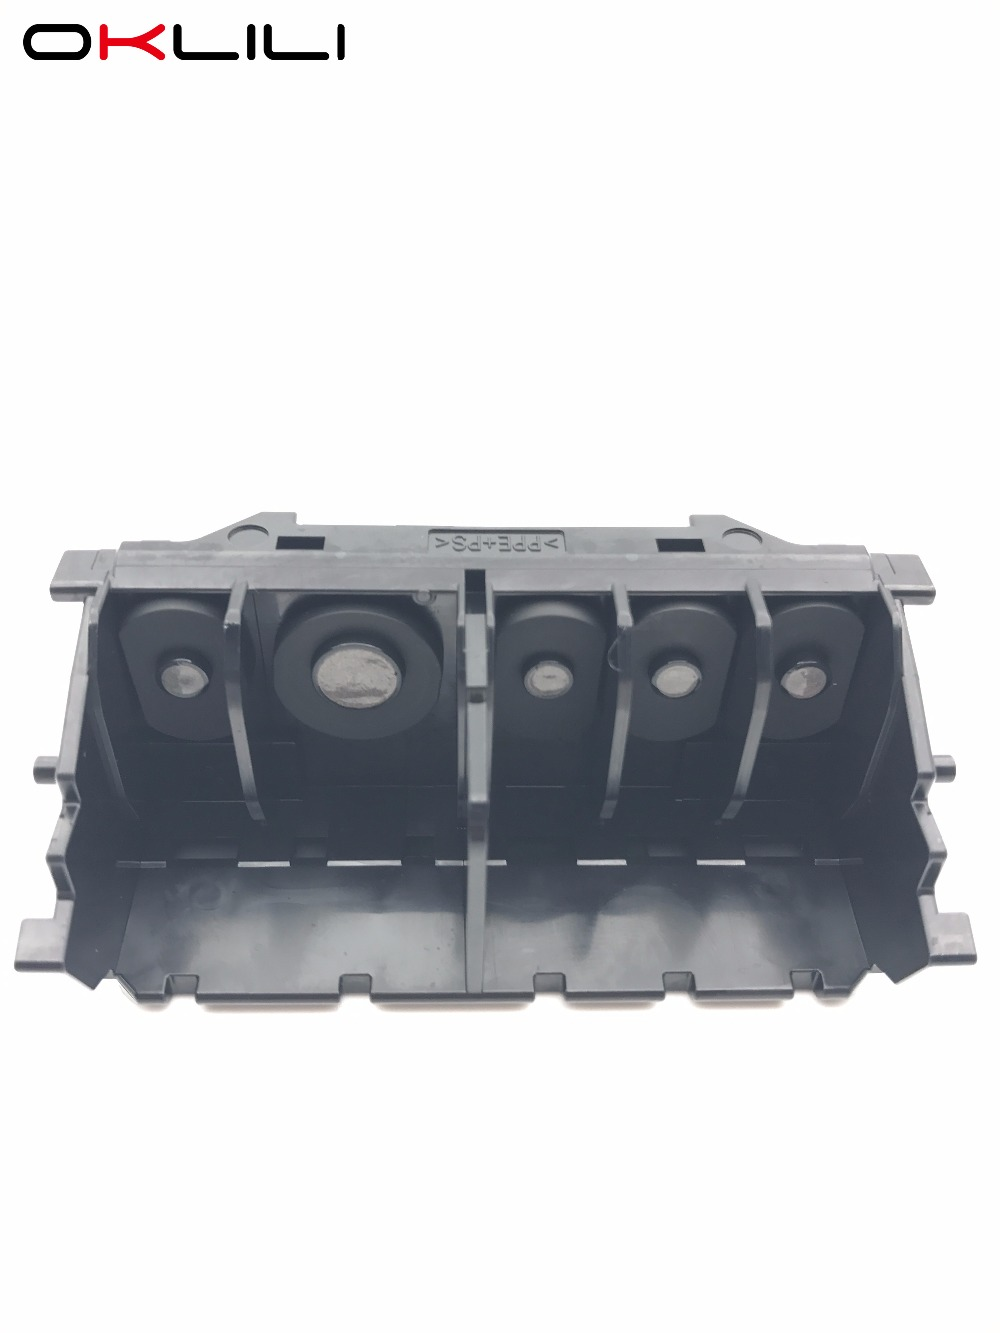 ORIGINAL NEW QY6 0082 QY6 0082 000 Printhead Print Head For Canon IP7220 IP7250 MG5420 MG5450